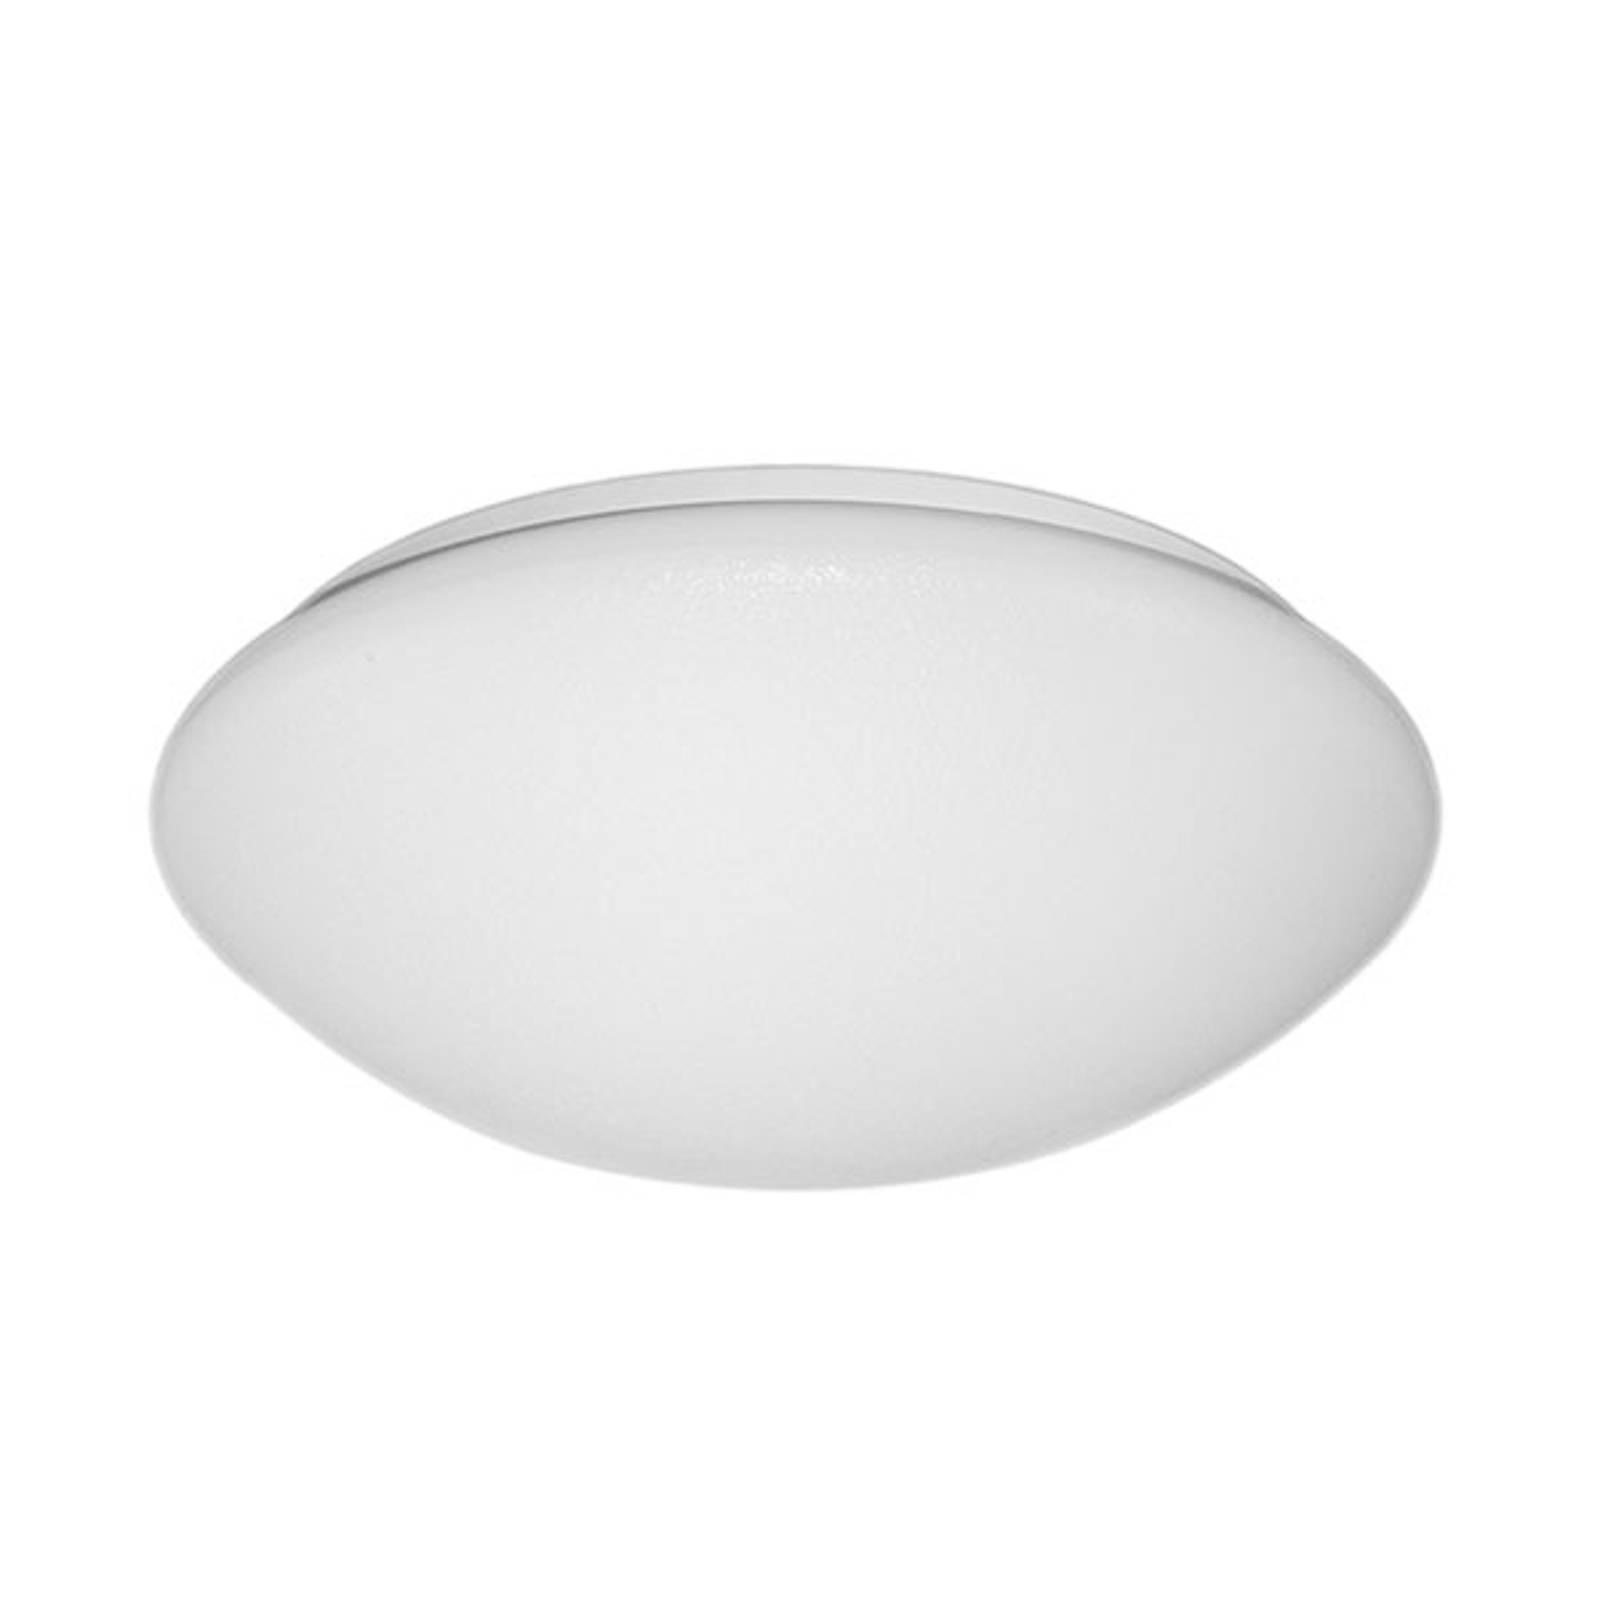 LED-kattovalaisin 27 W, 4 000 K